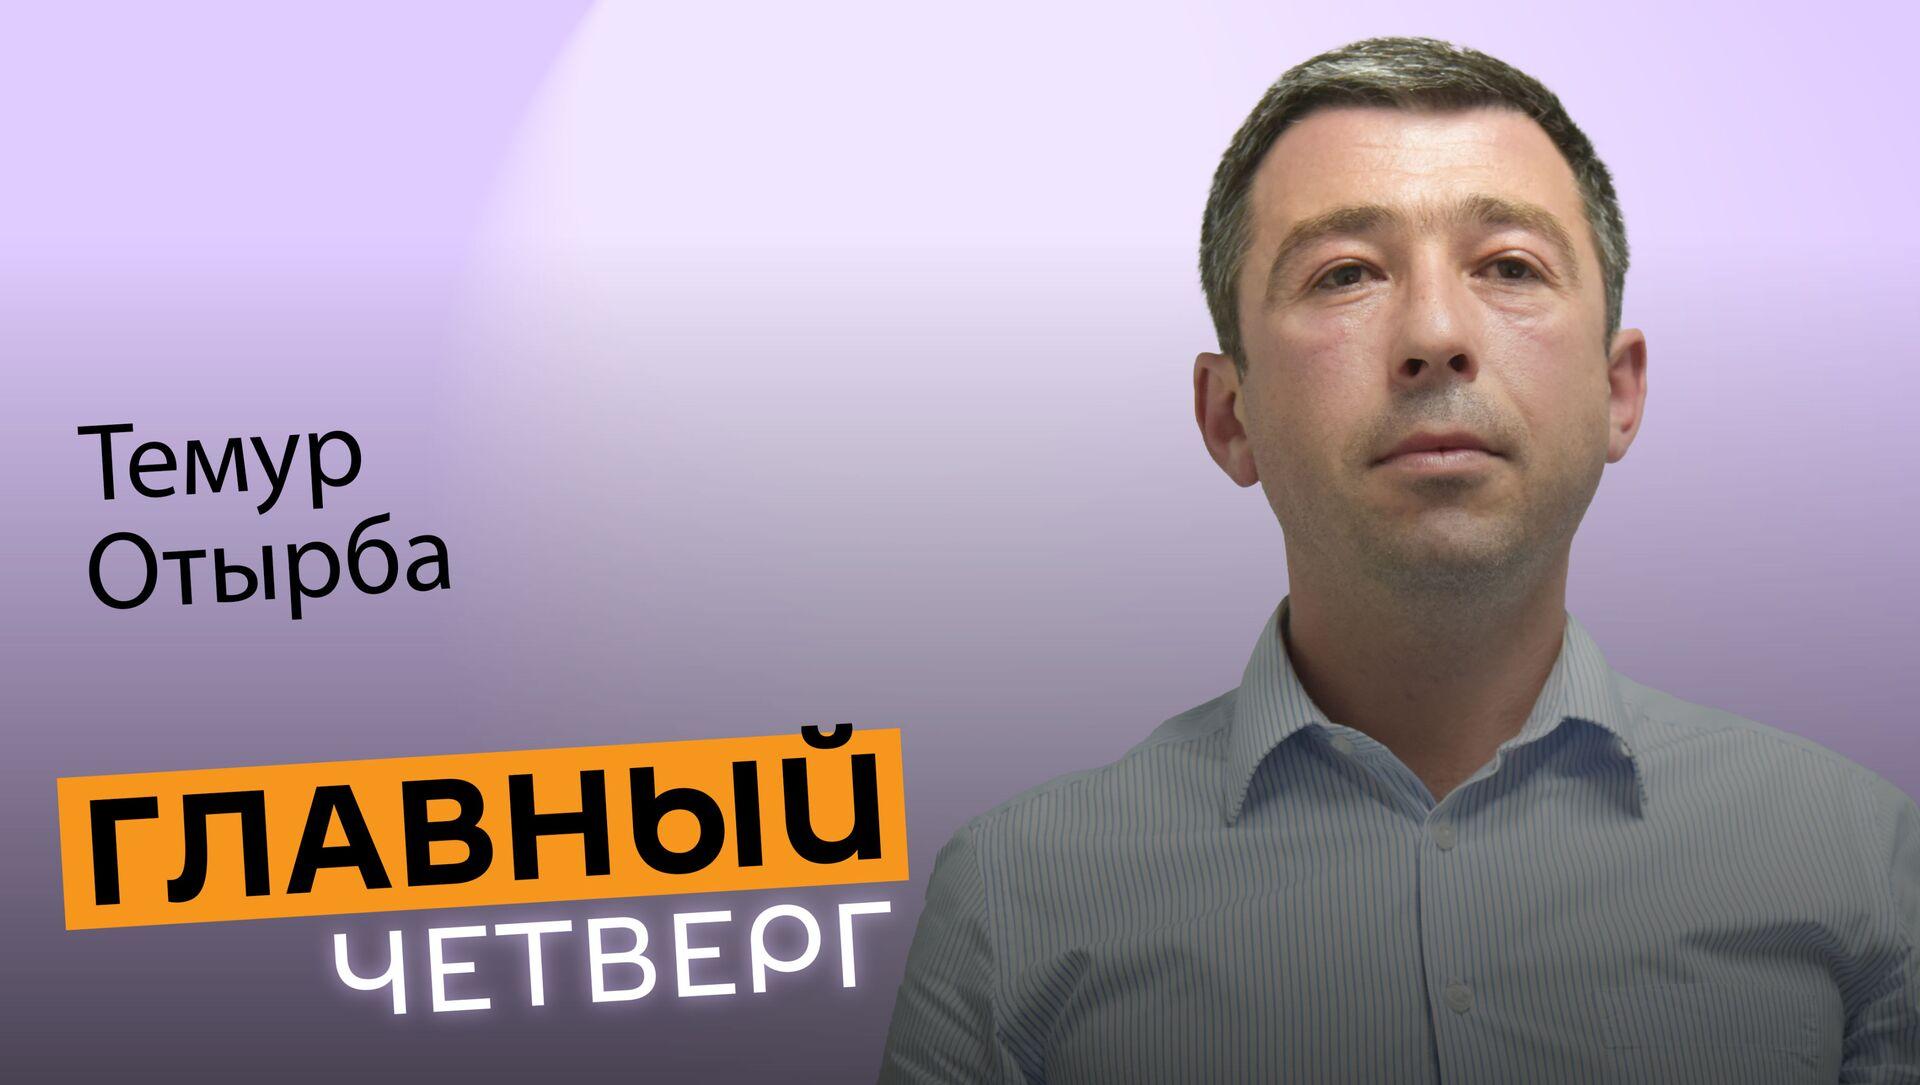 Темур Отырба  - Sputnik Абхазия, 1920, 09.09.2021